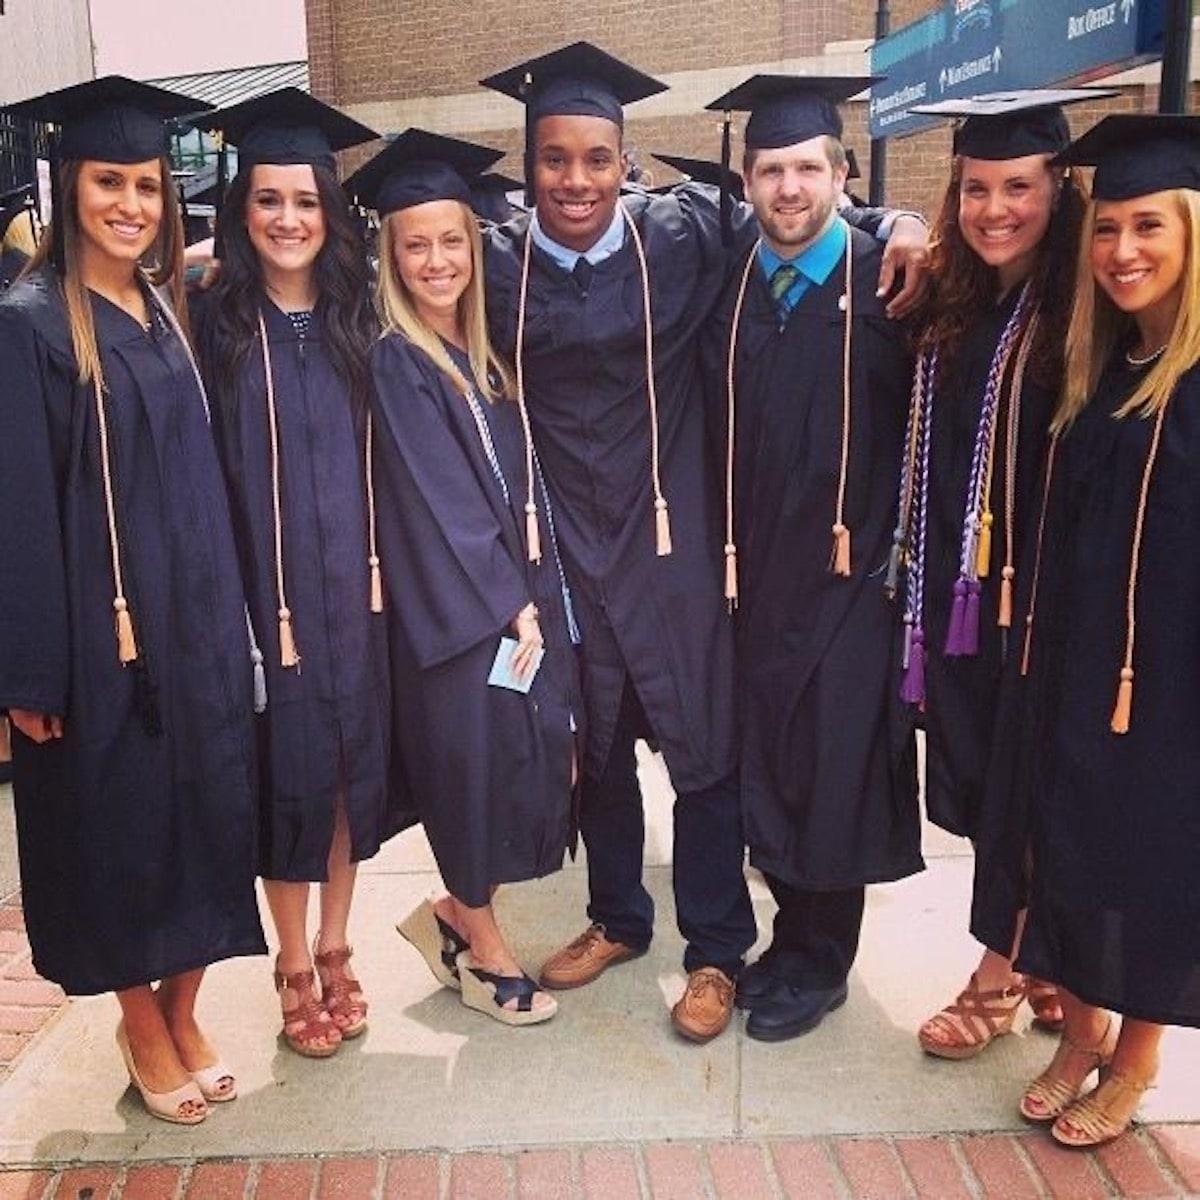 Ashley West, Class 2013 - Graduation 2013!